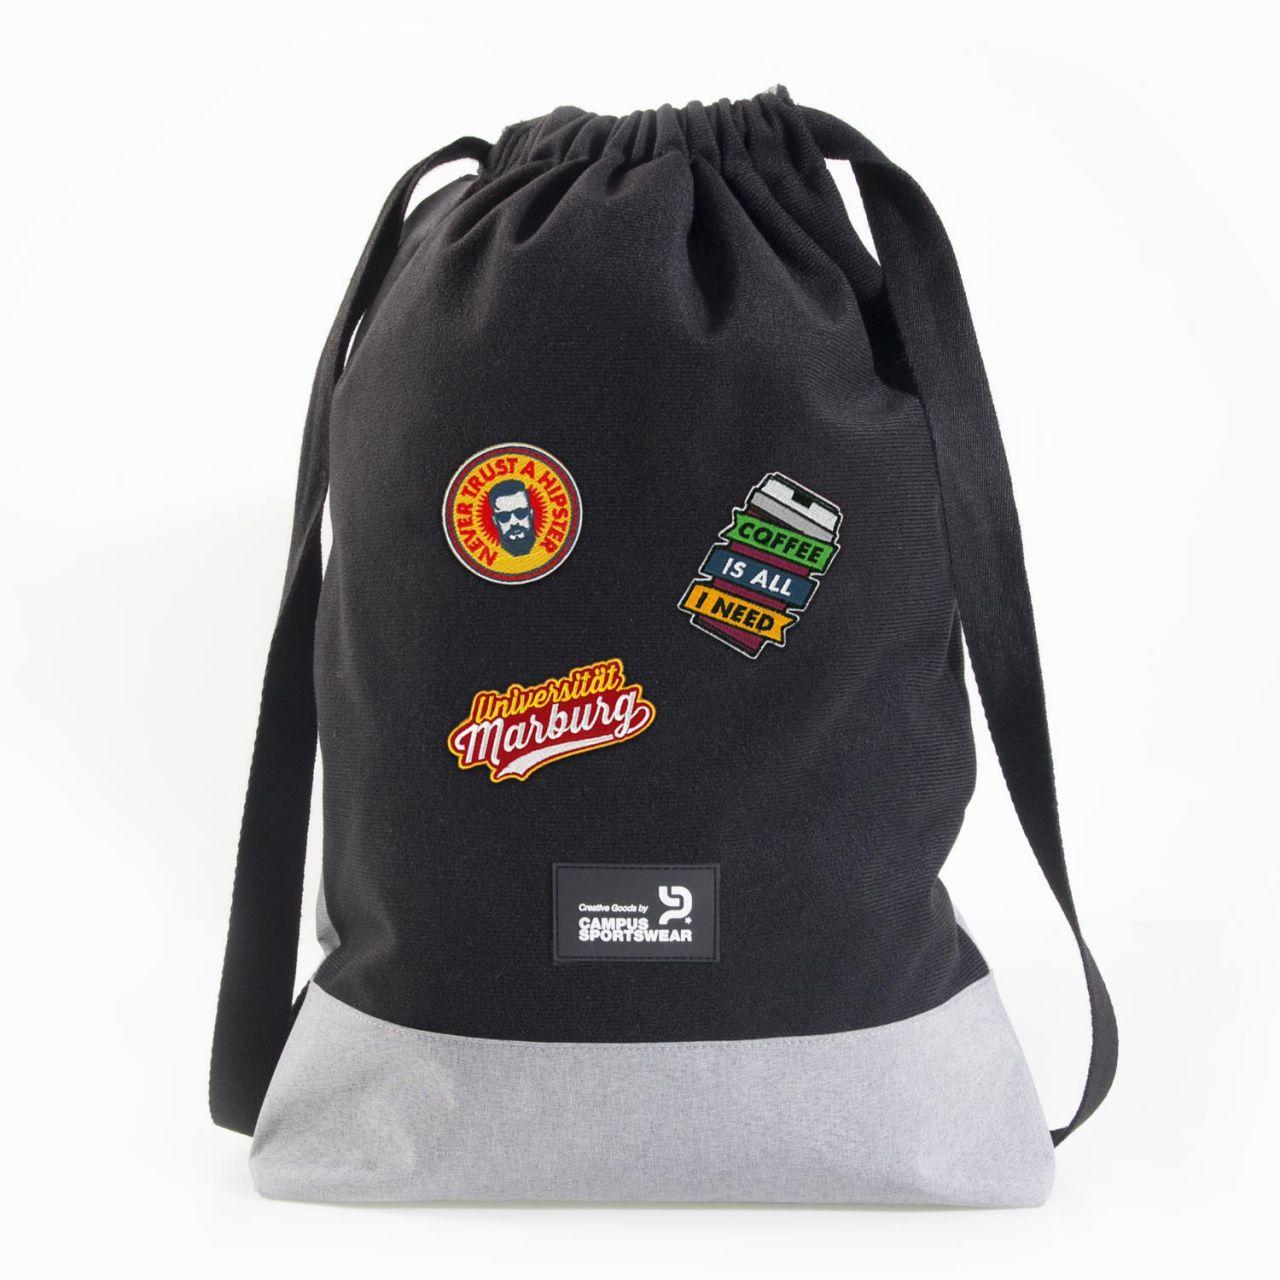 Gym Bag, black / heather grey, Patch It